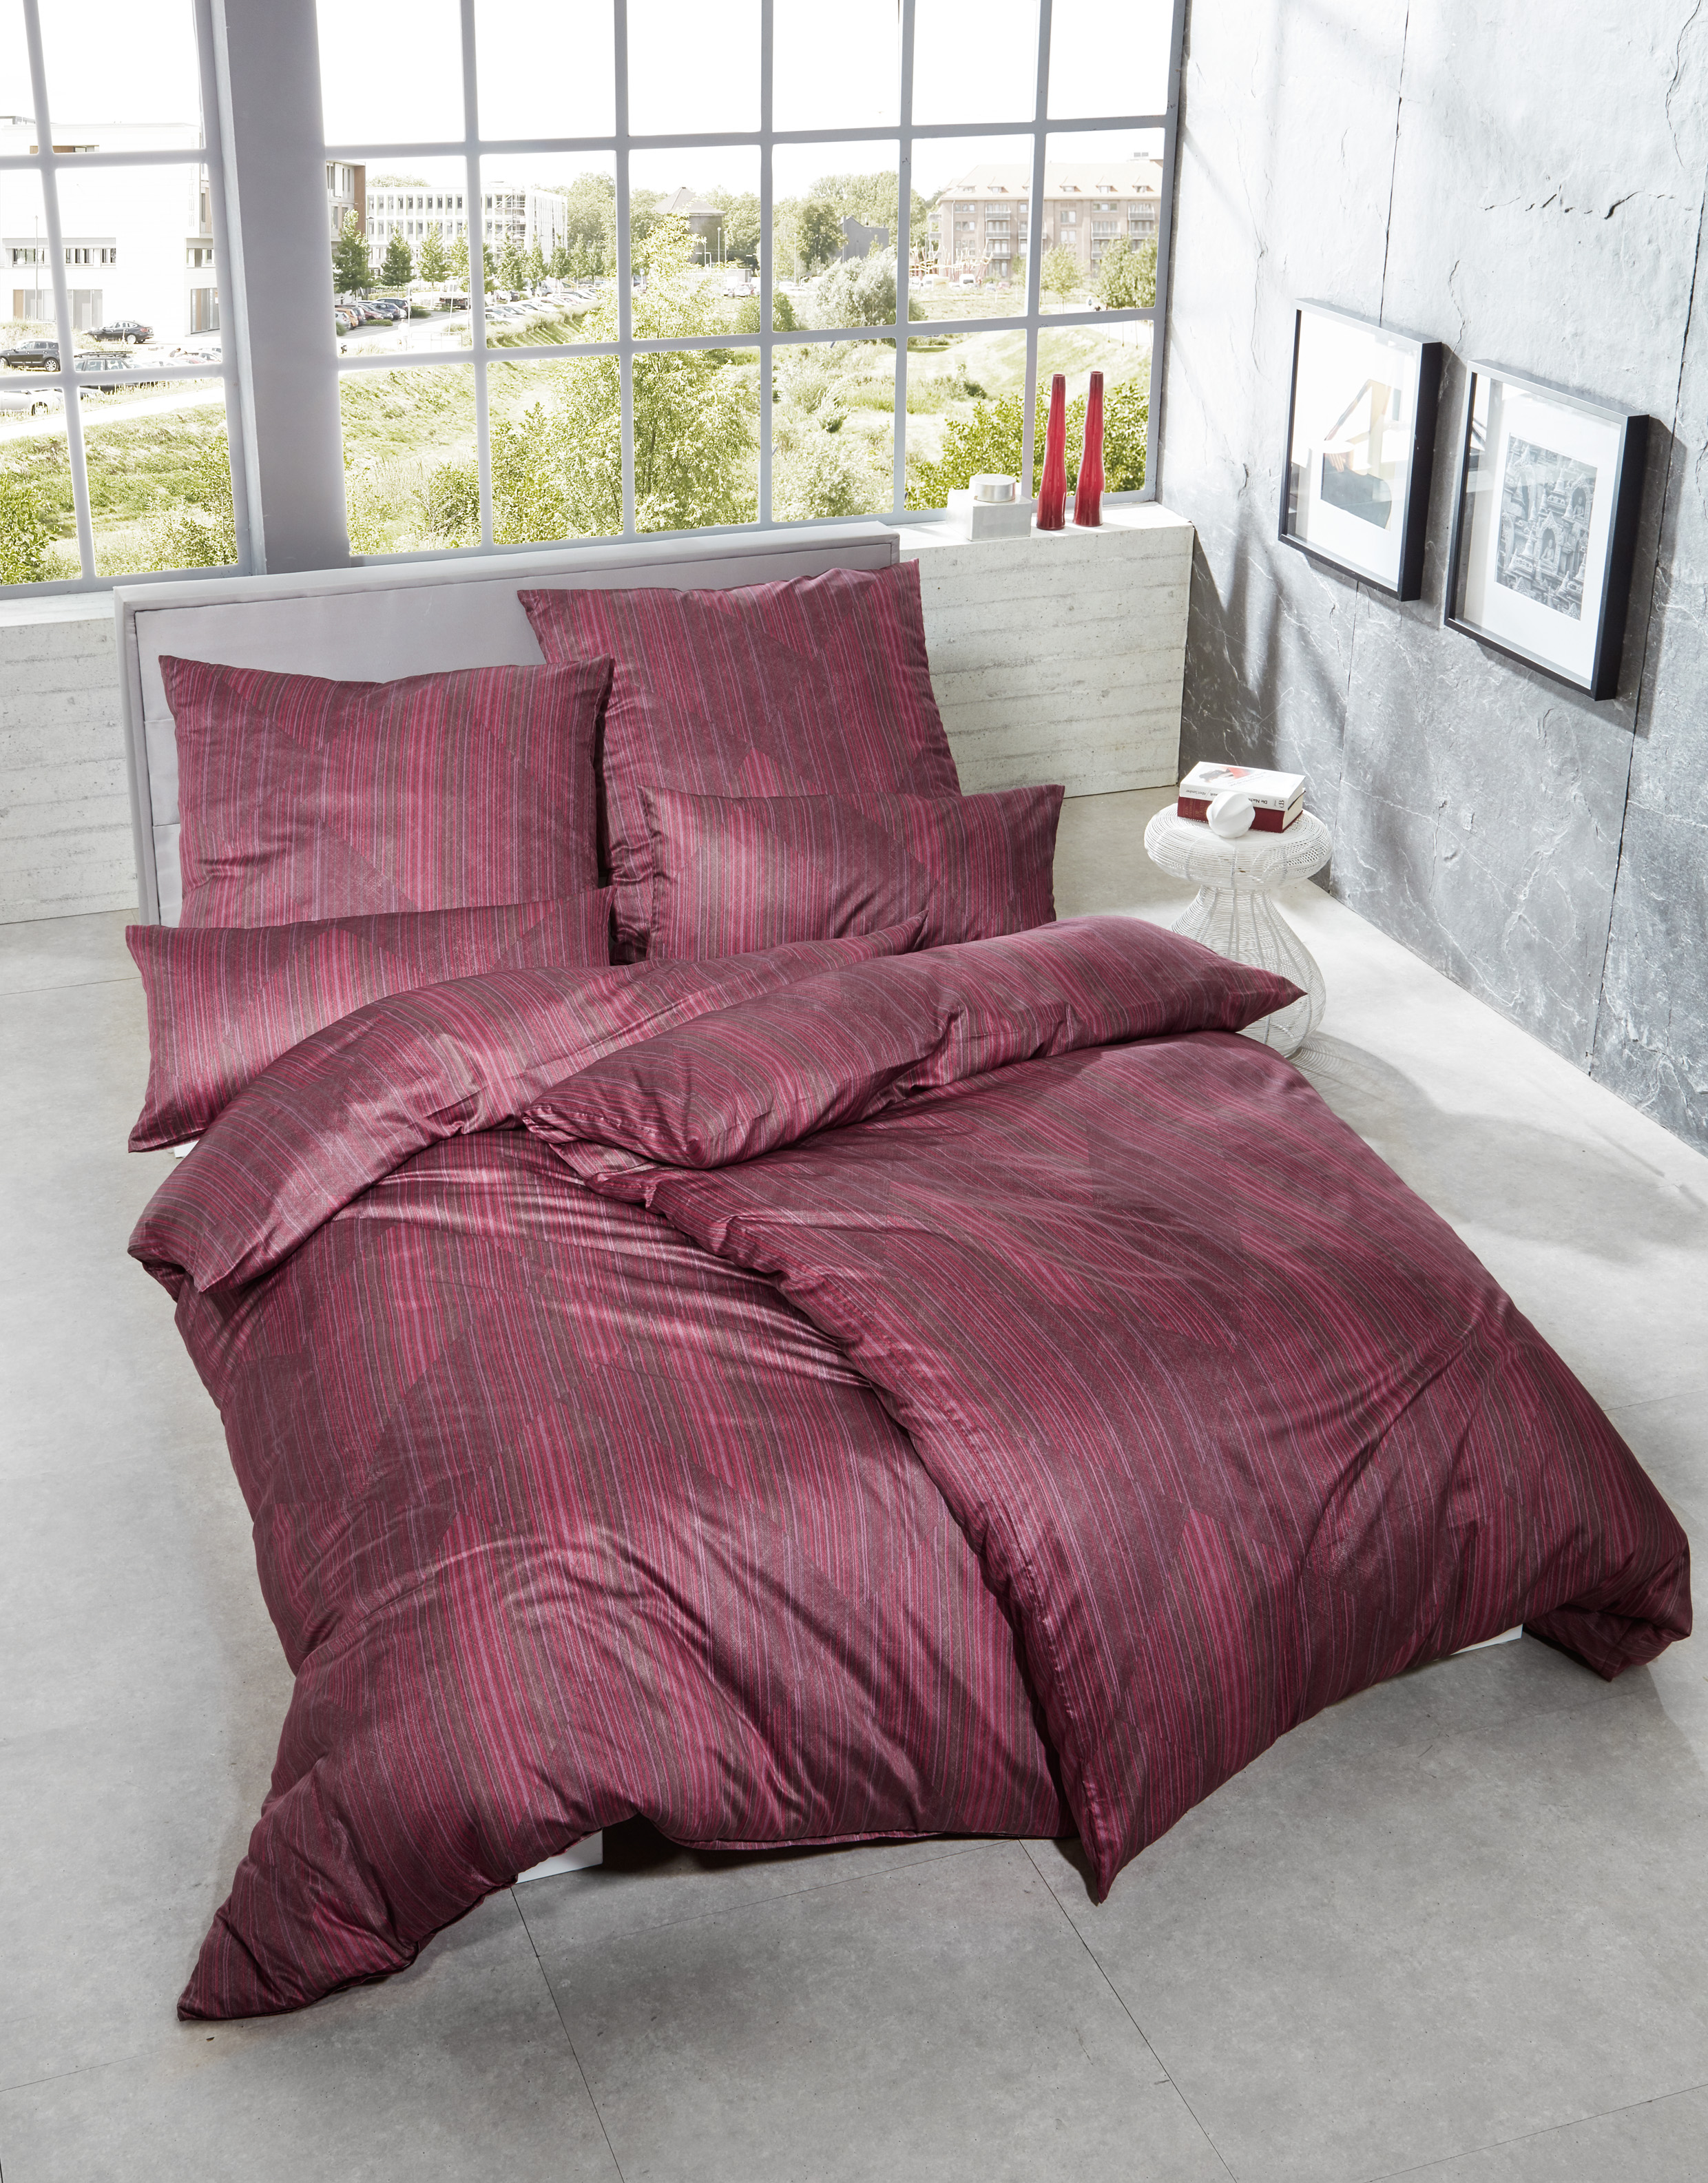 premium satin de luxe luxury bettw sche deutsche premiumprodukte. Black Bedroom Furniture Sets. Home Design Ideas